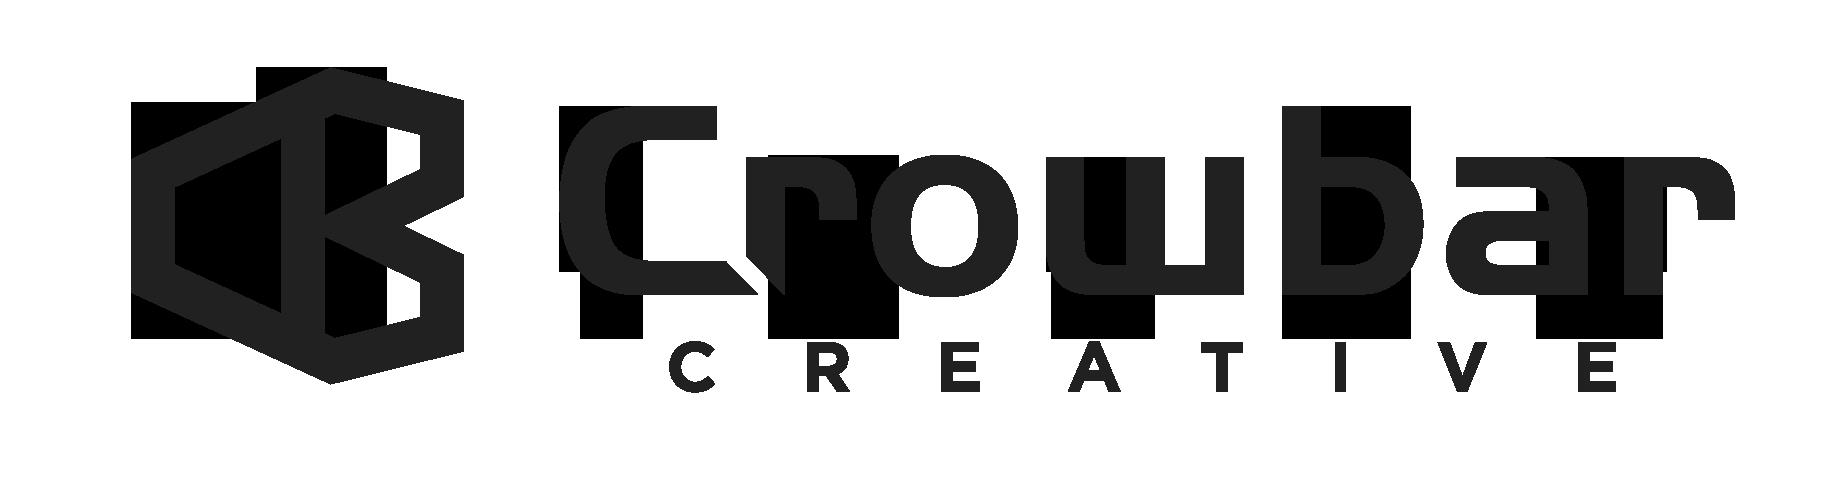 Crowbar Creative